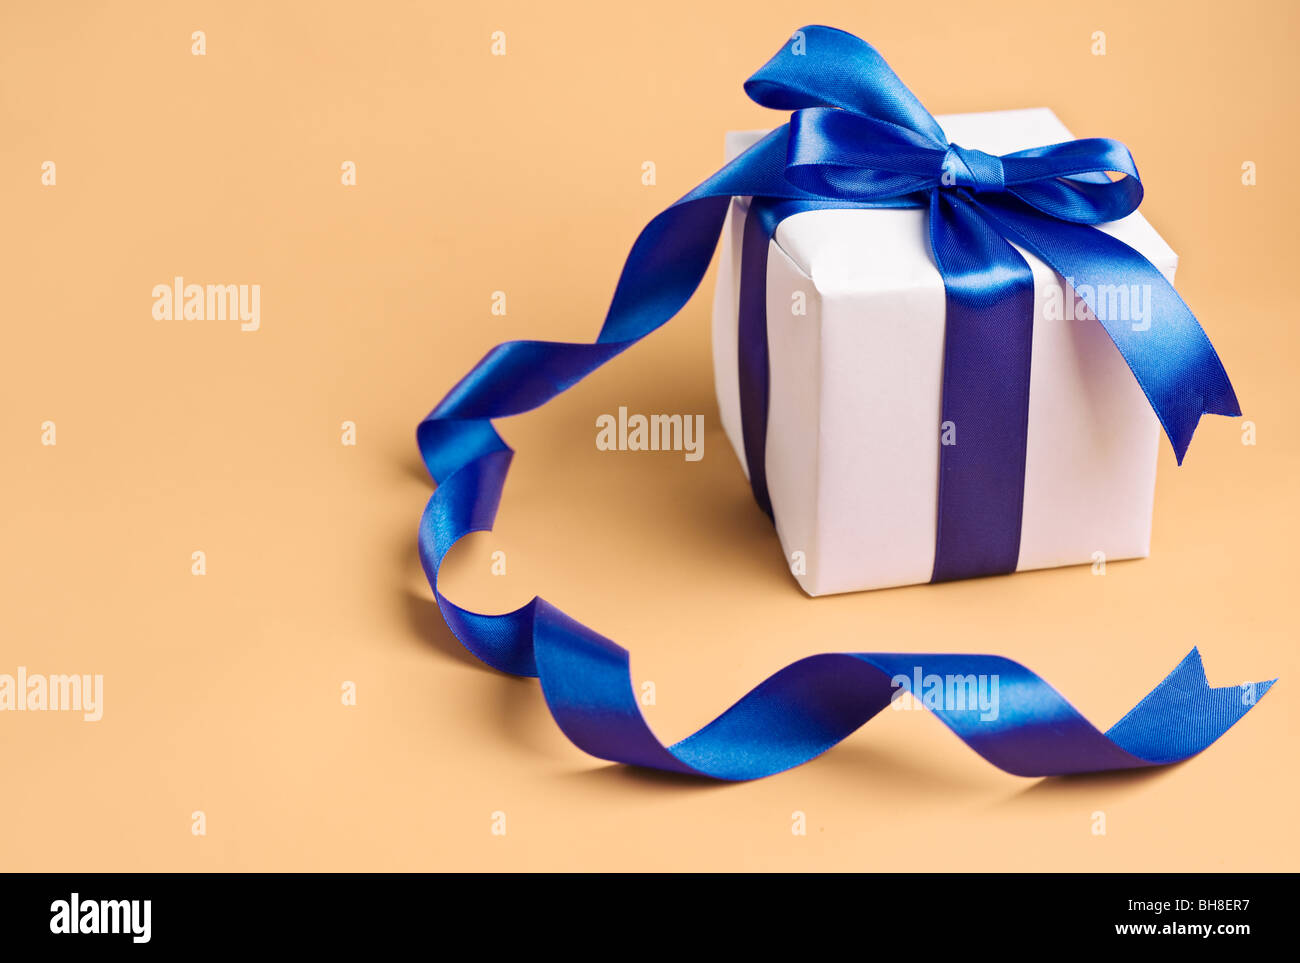 Don blanco con cinta azul sobre un fondo biege Imagen De Stock